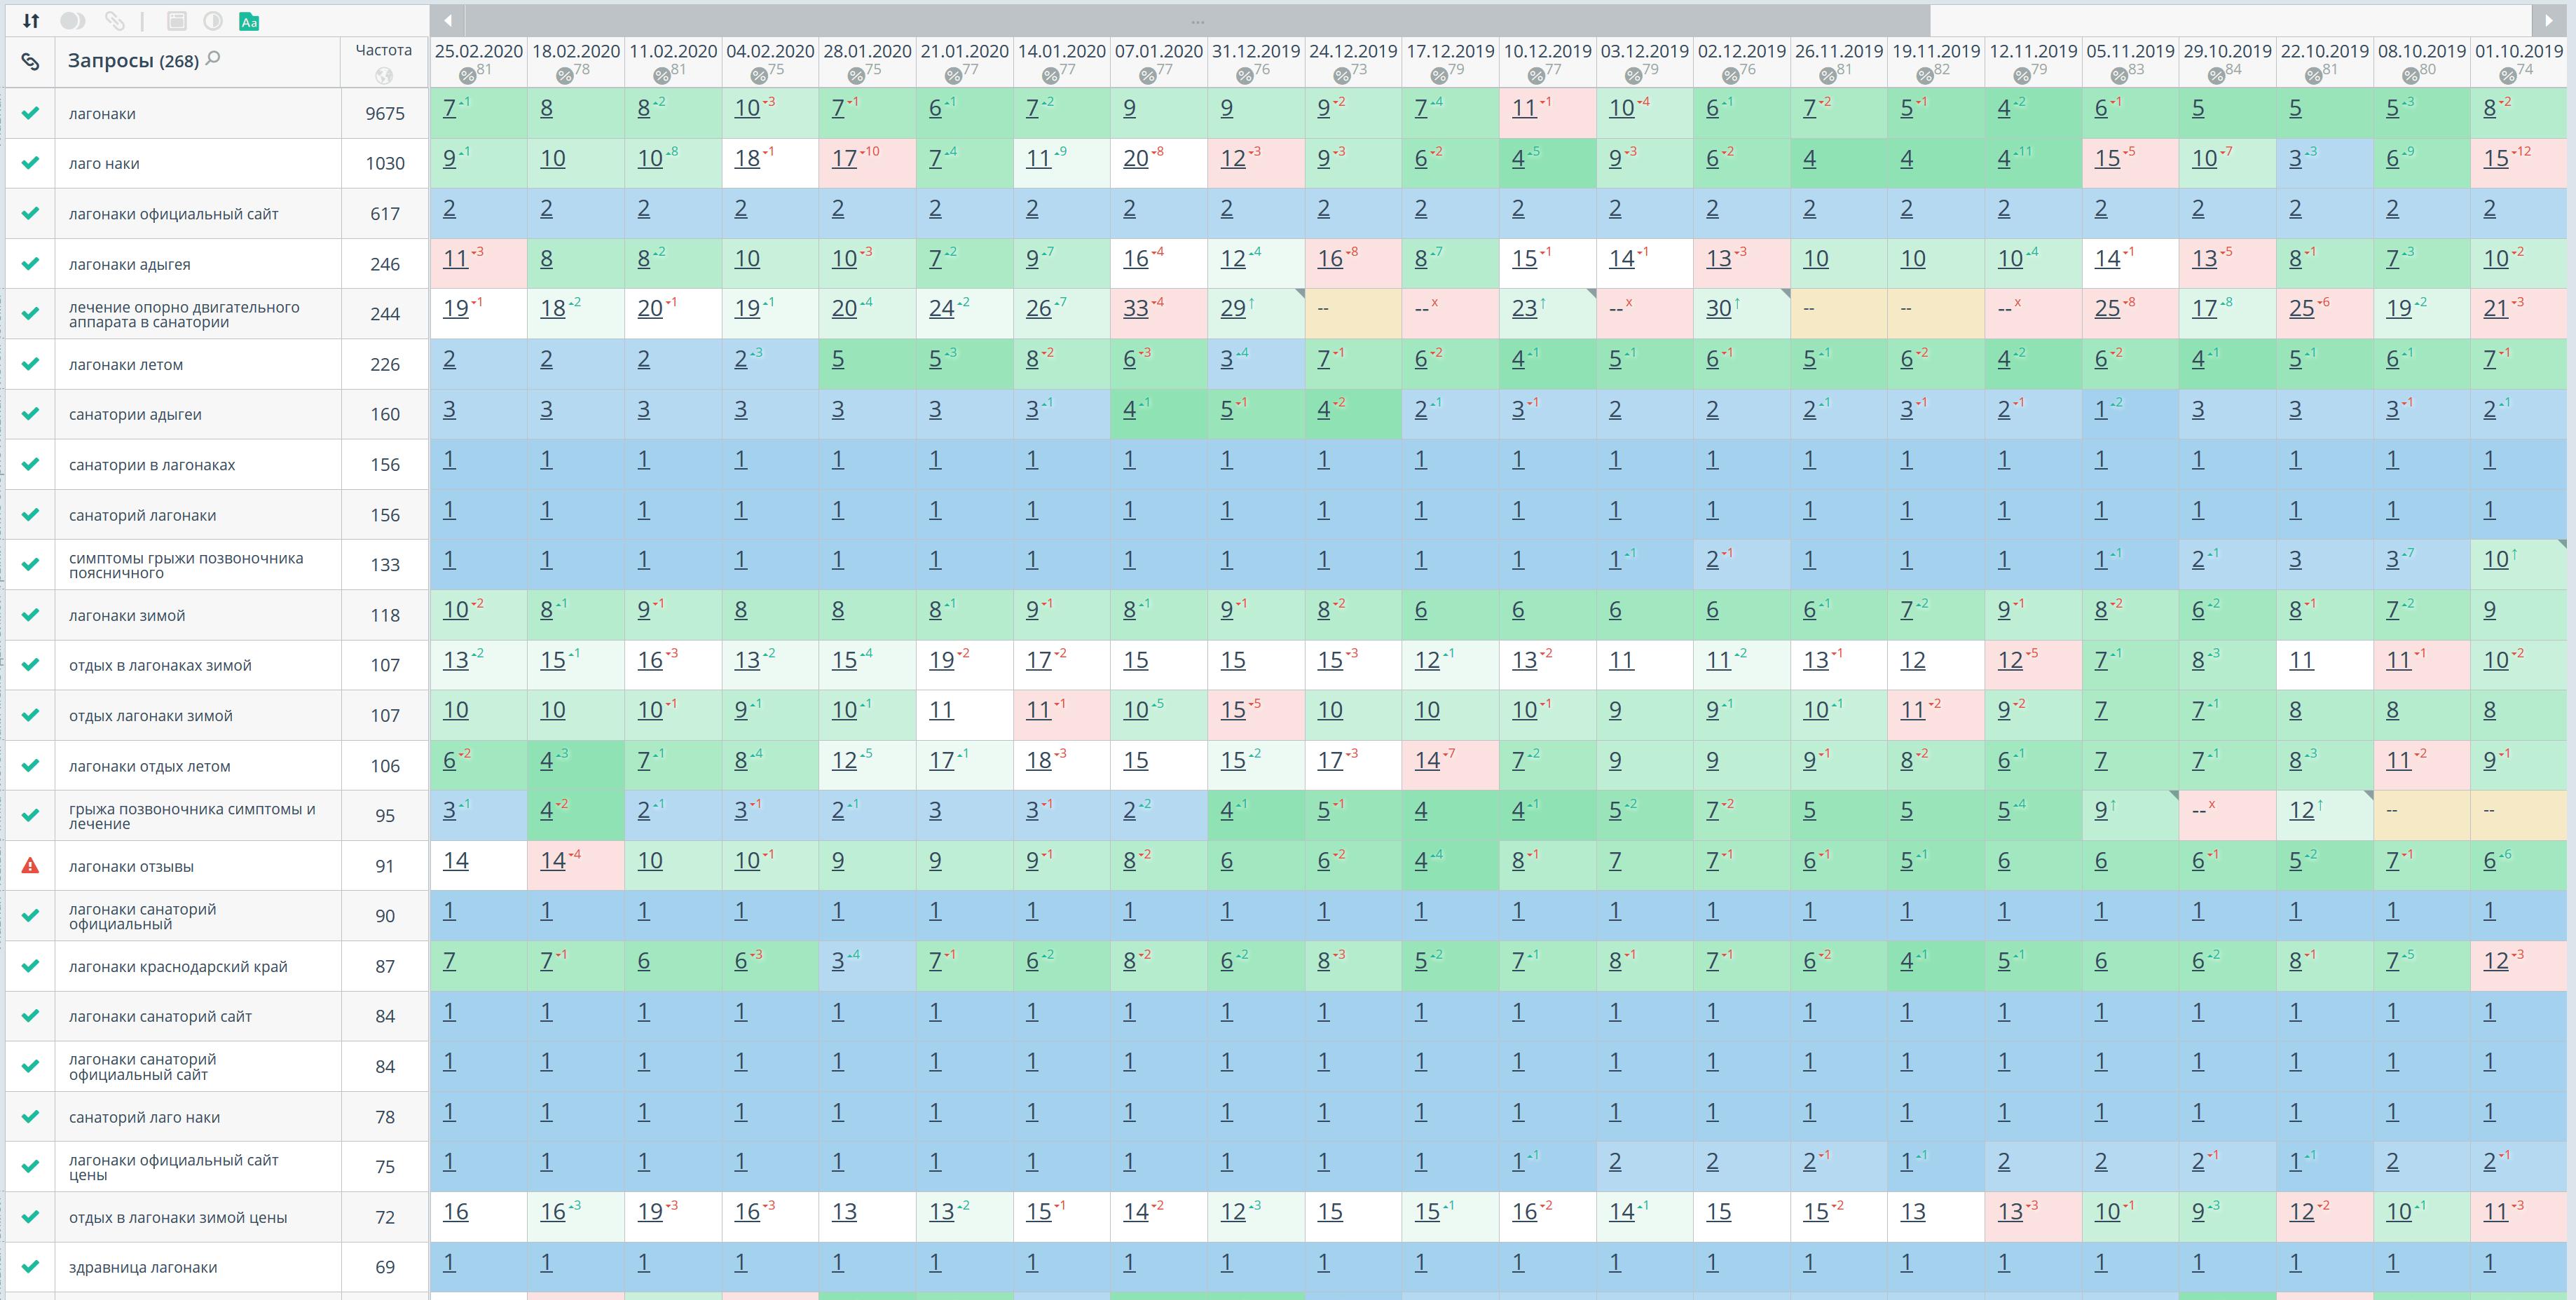 Статистика позиций по Яндексу, регион Краснодар